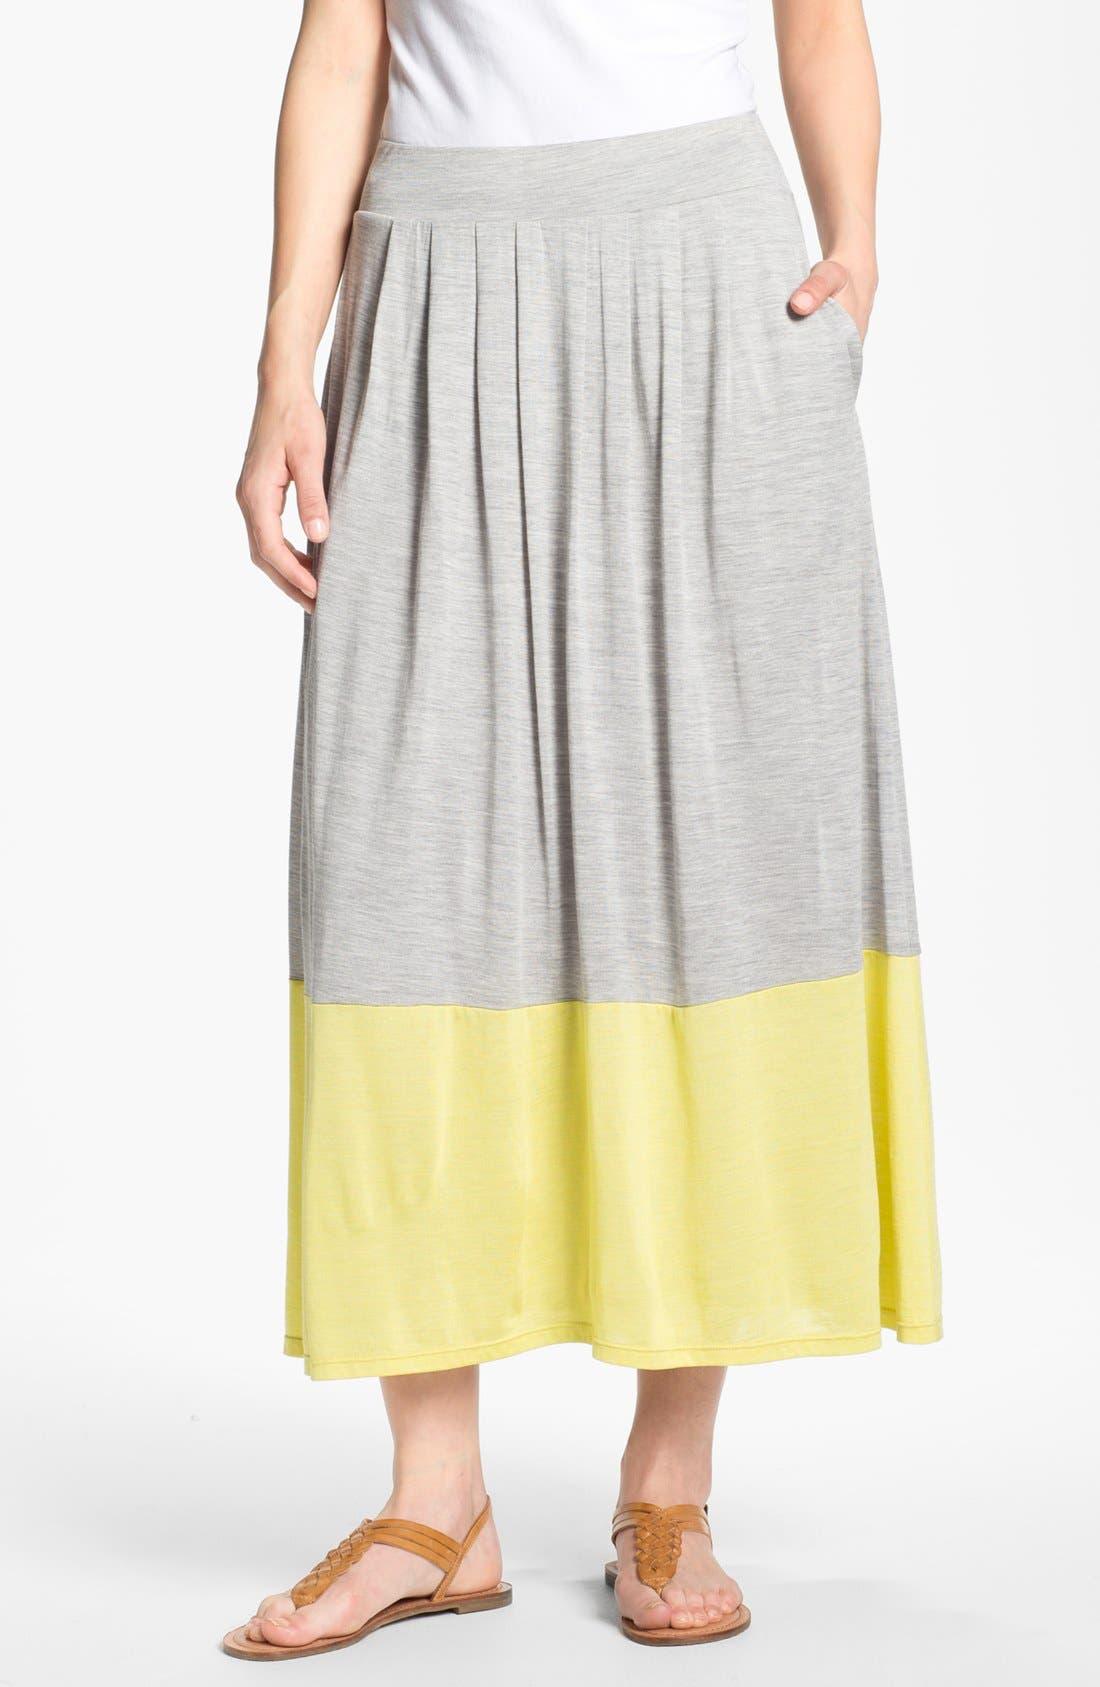 Alternate Image 1 Selected - Eileen Fisher Pleated Colorblock Midi Skirt (Regular & Petite)